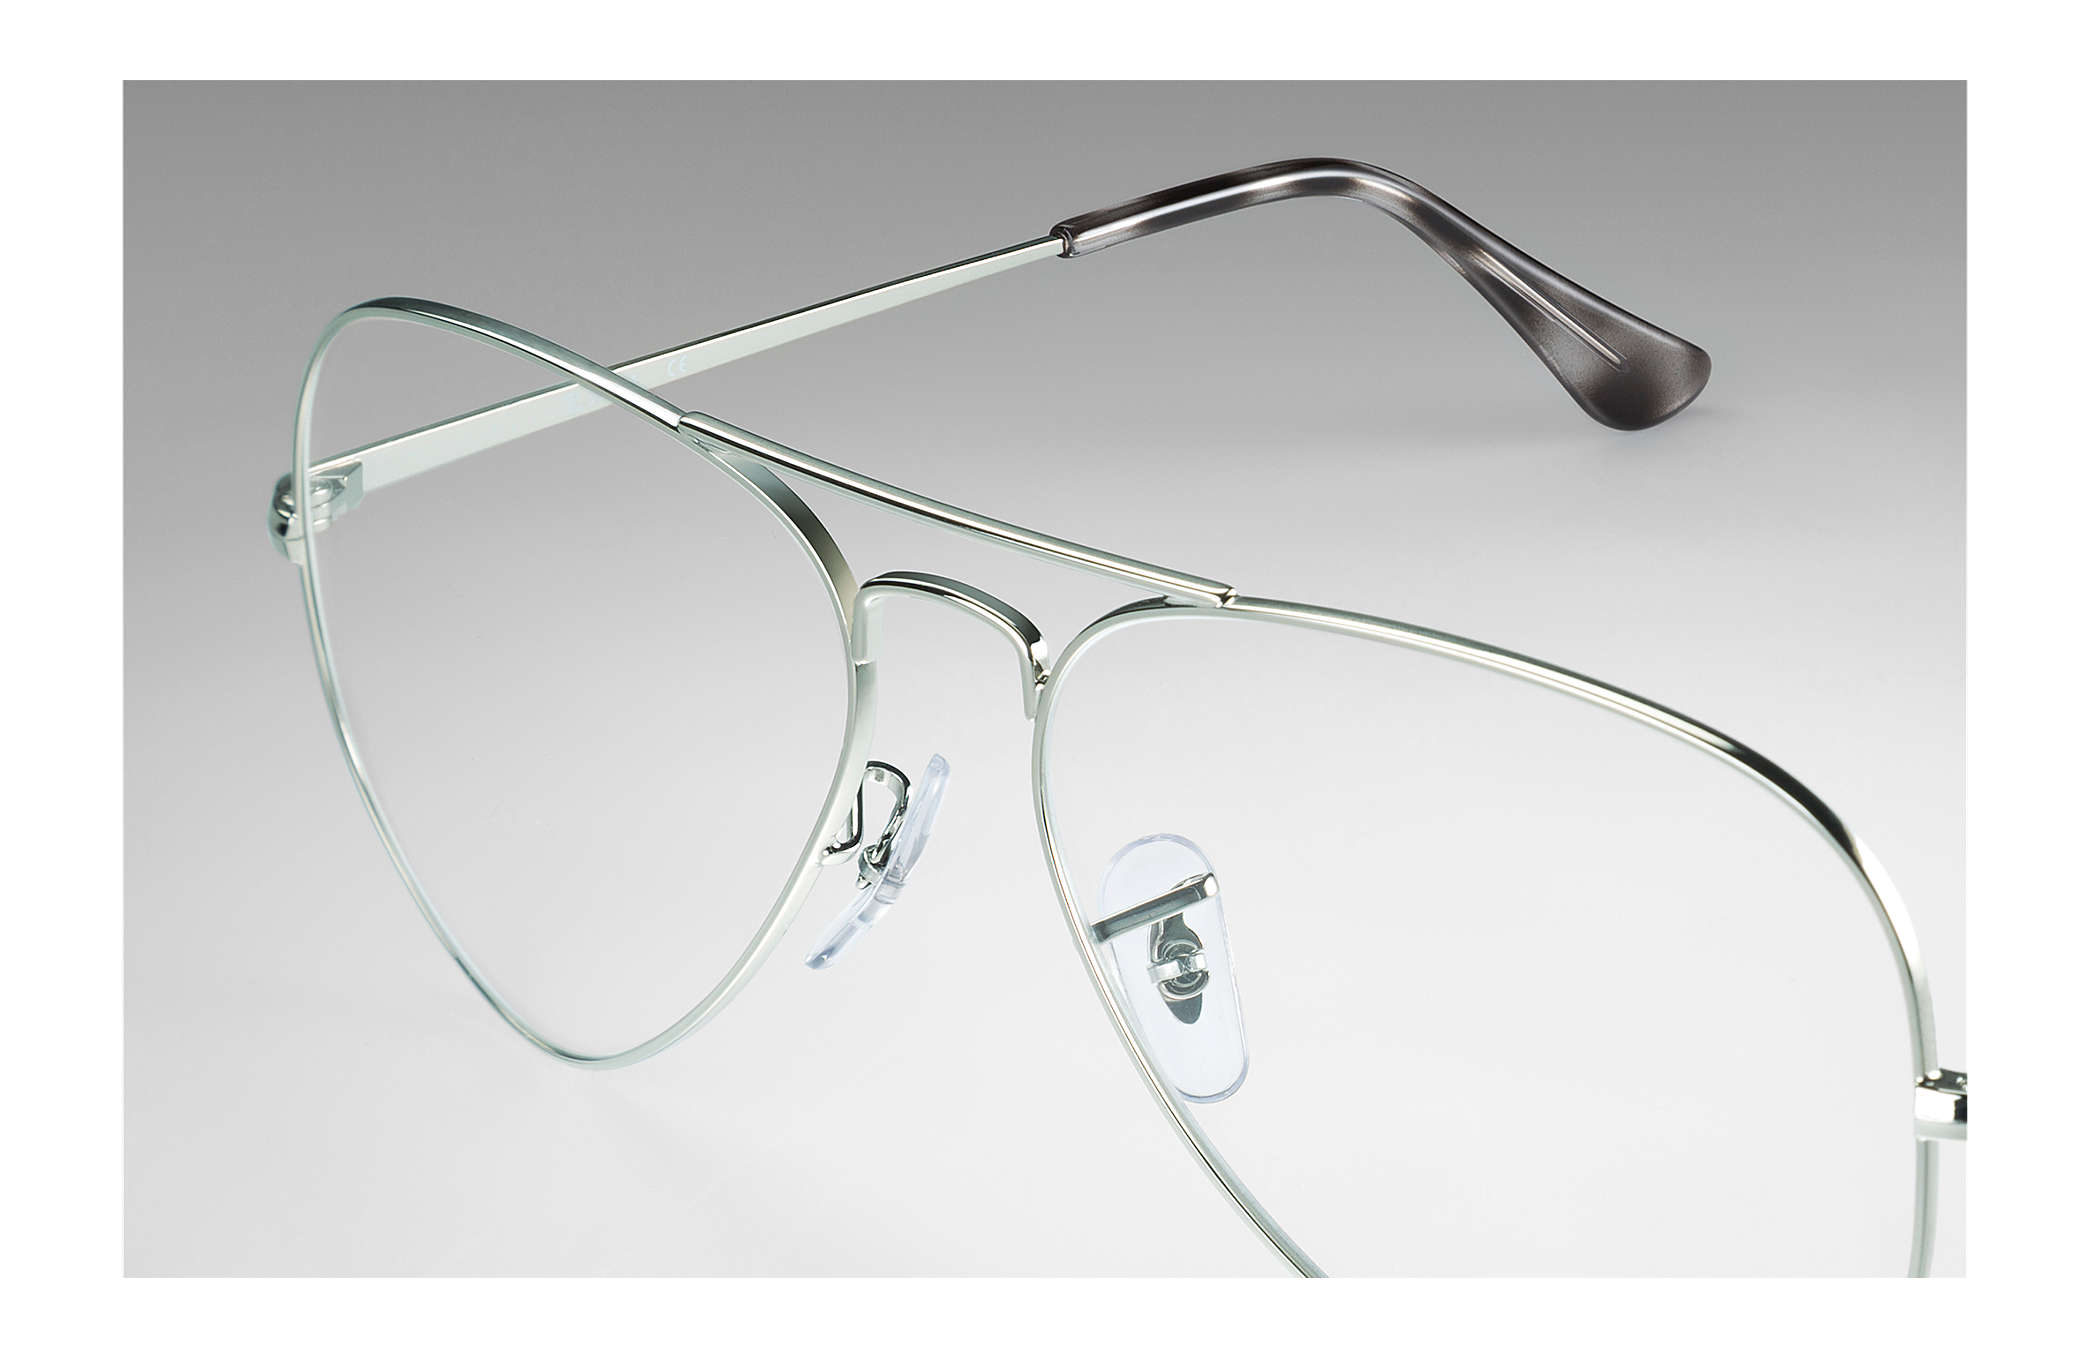 e9a7d86b0 Ray-Ban eyeglasses Aviator Optics RB6489 Silver - Metal ...